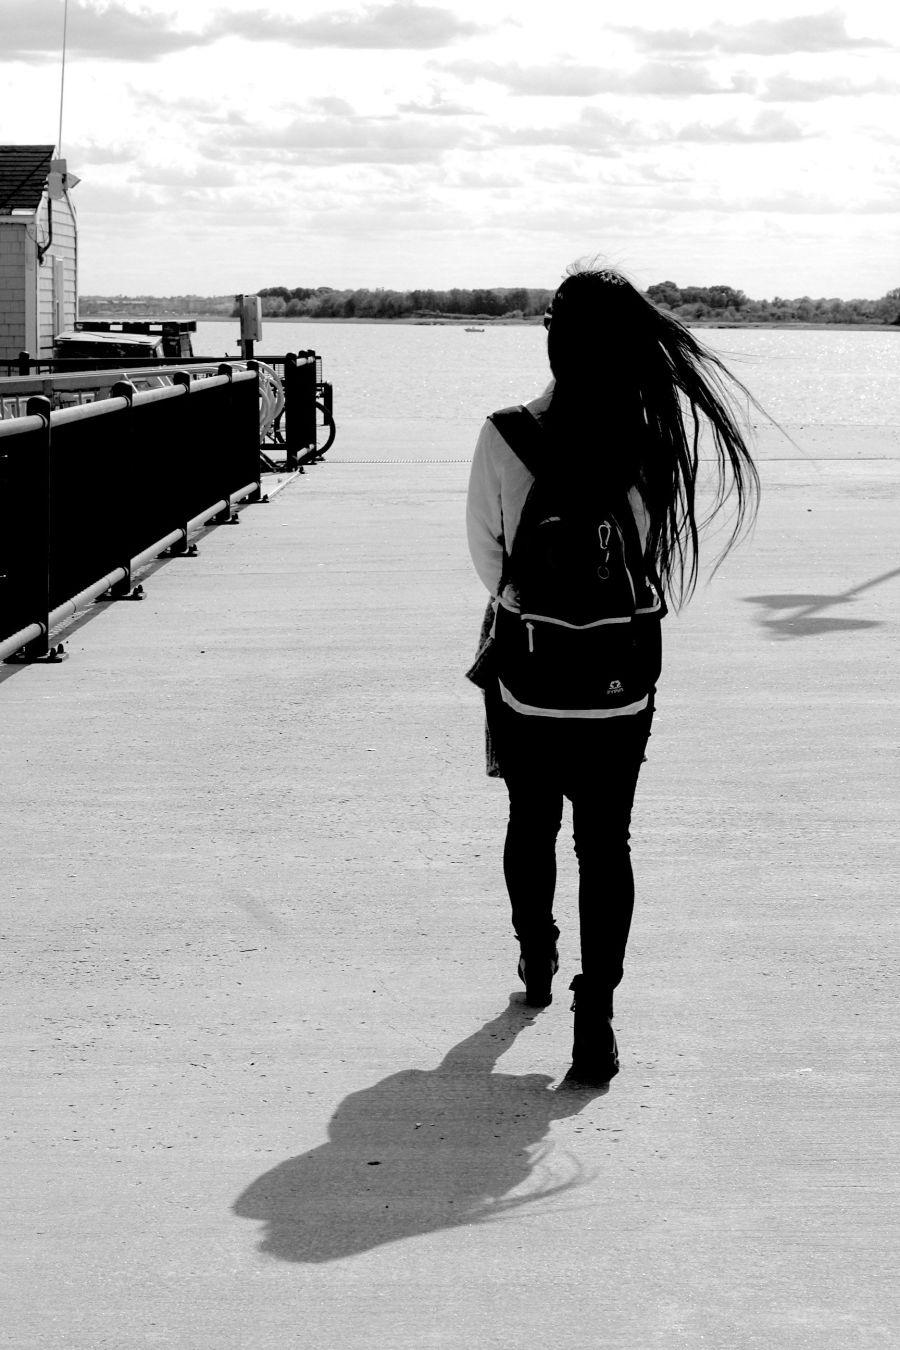 boston spectacle island girl walking